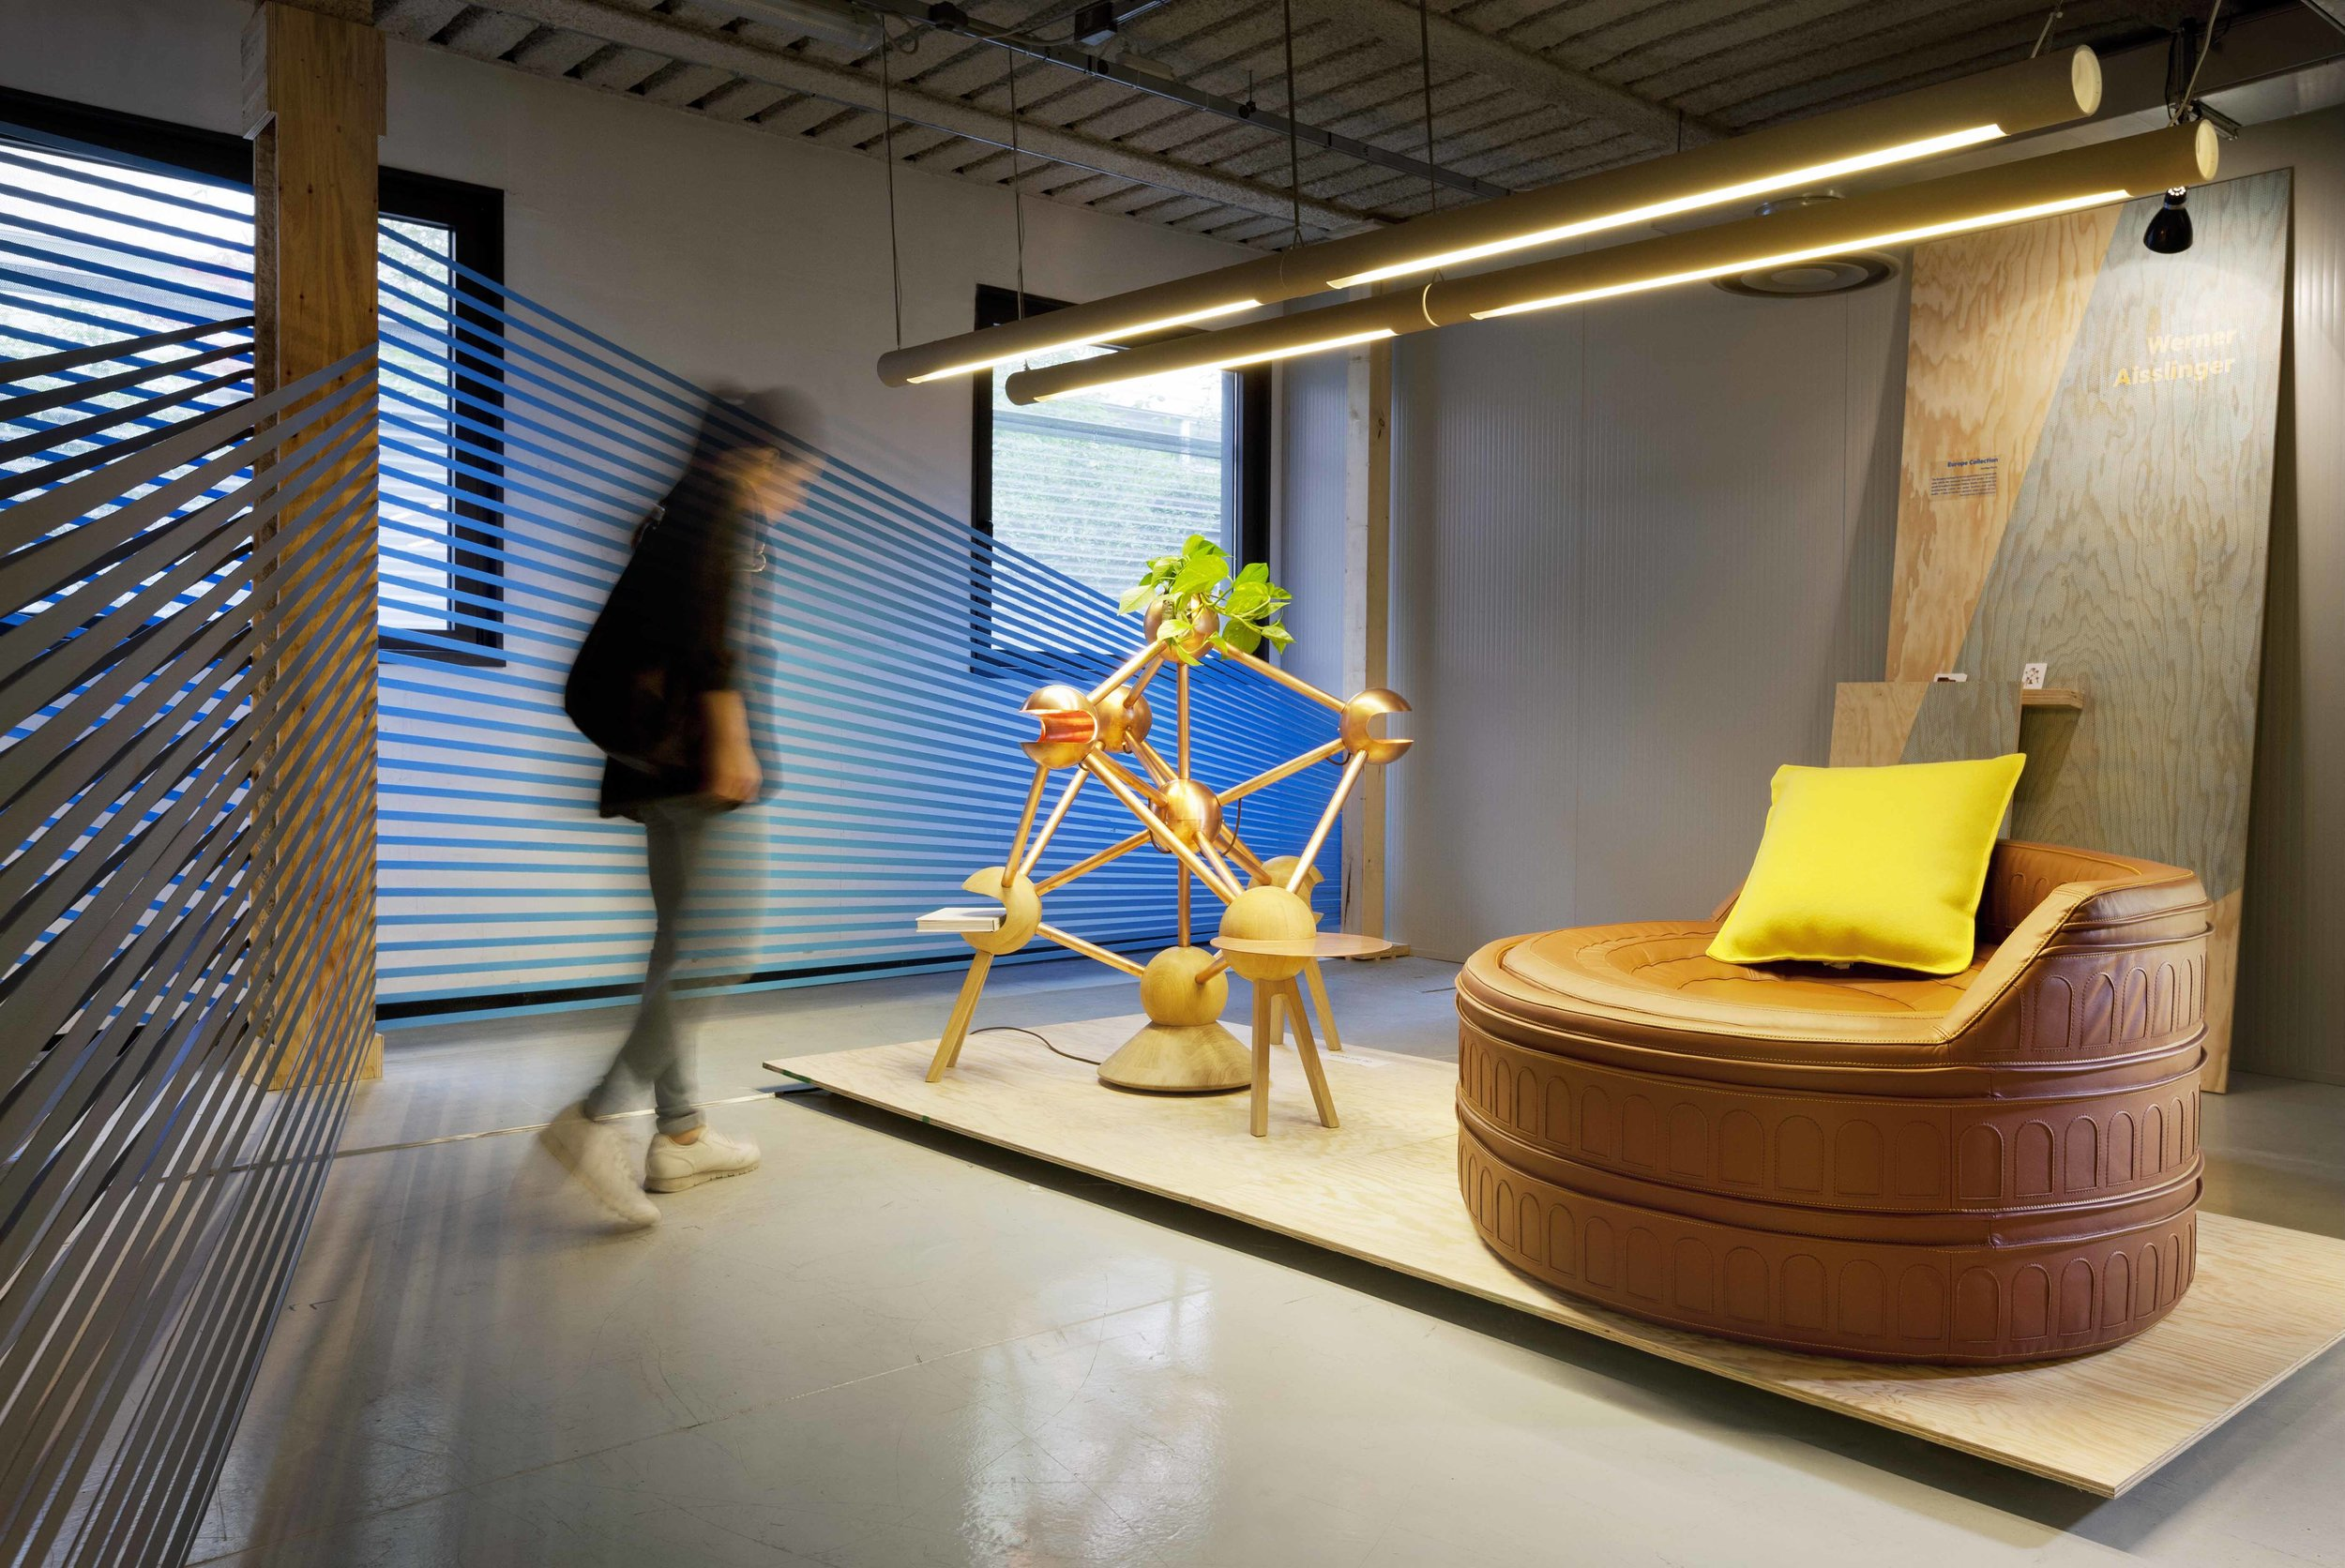 berlin-design-selection-milan_tradefair-exhibition-design_coordination-berlin__02.jpg